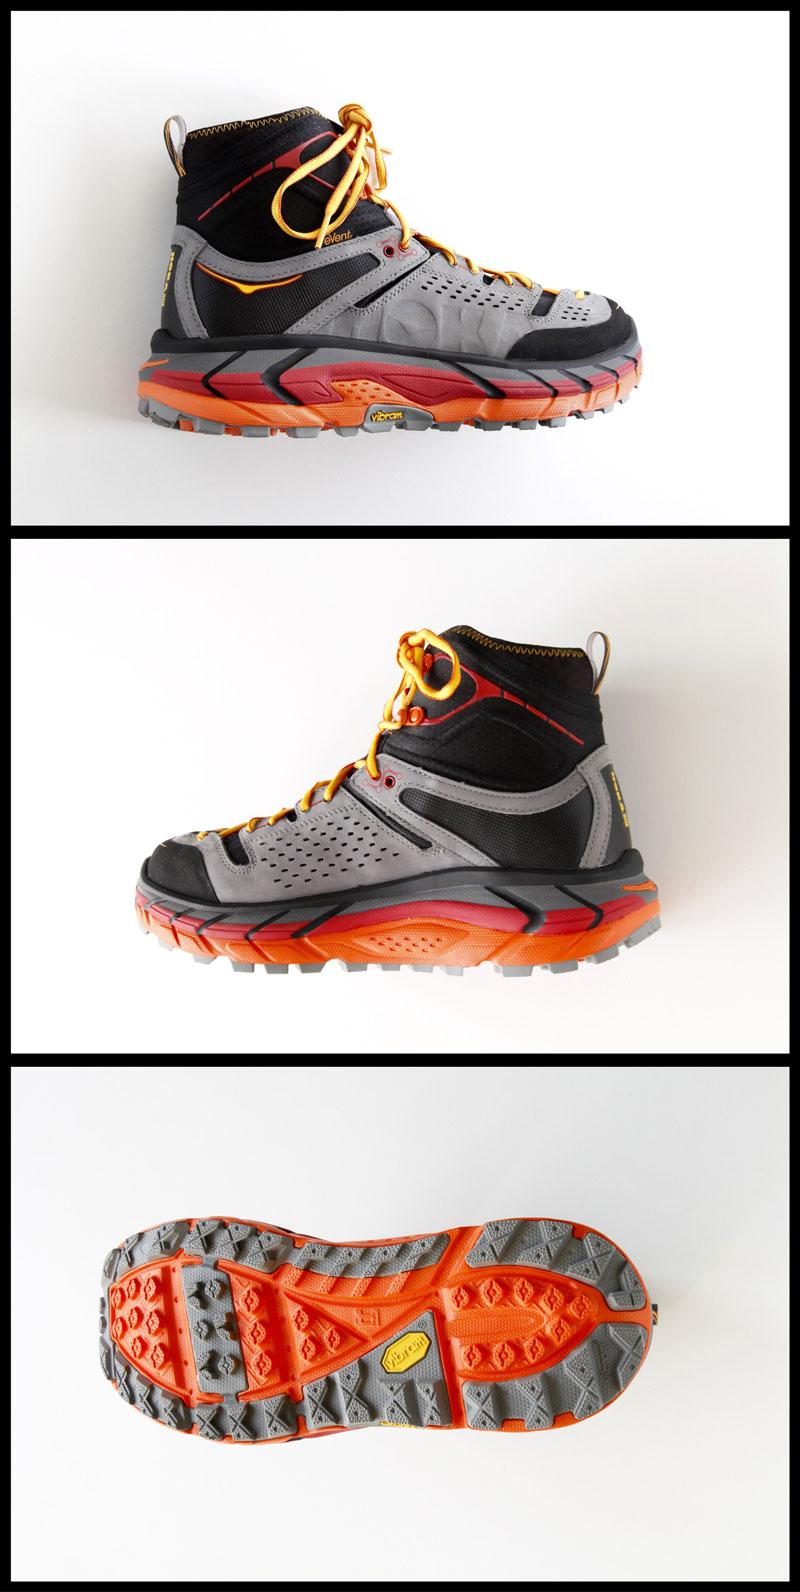 La chaussure de randonnée Hoka One One Tor Ultra HI WP, Ph. Moctar KANE.